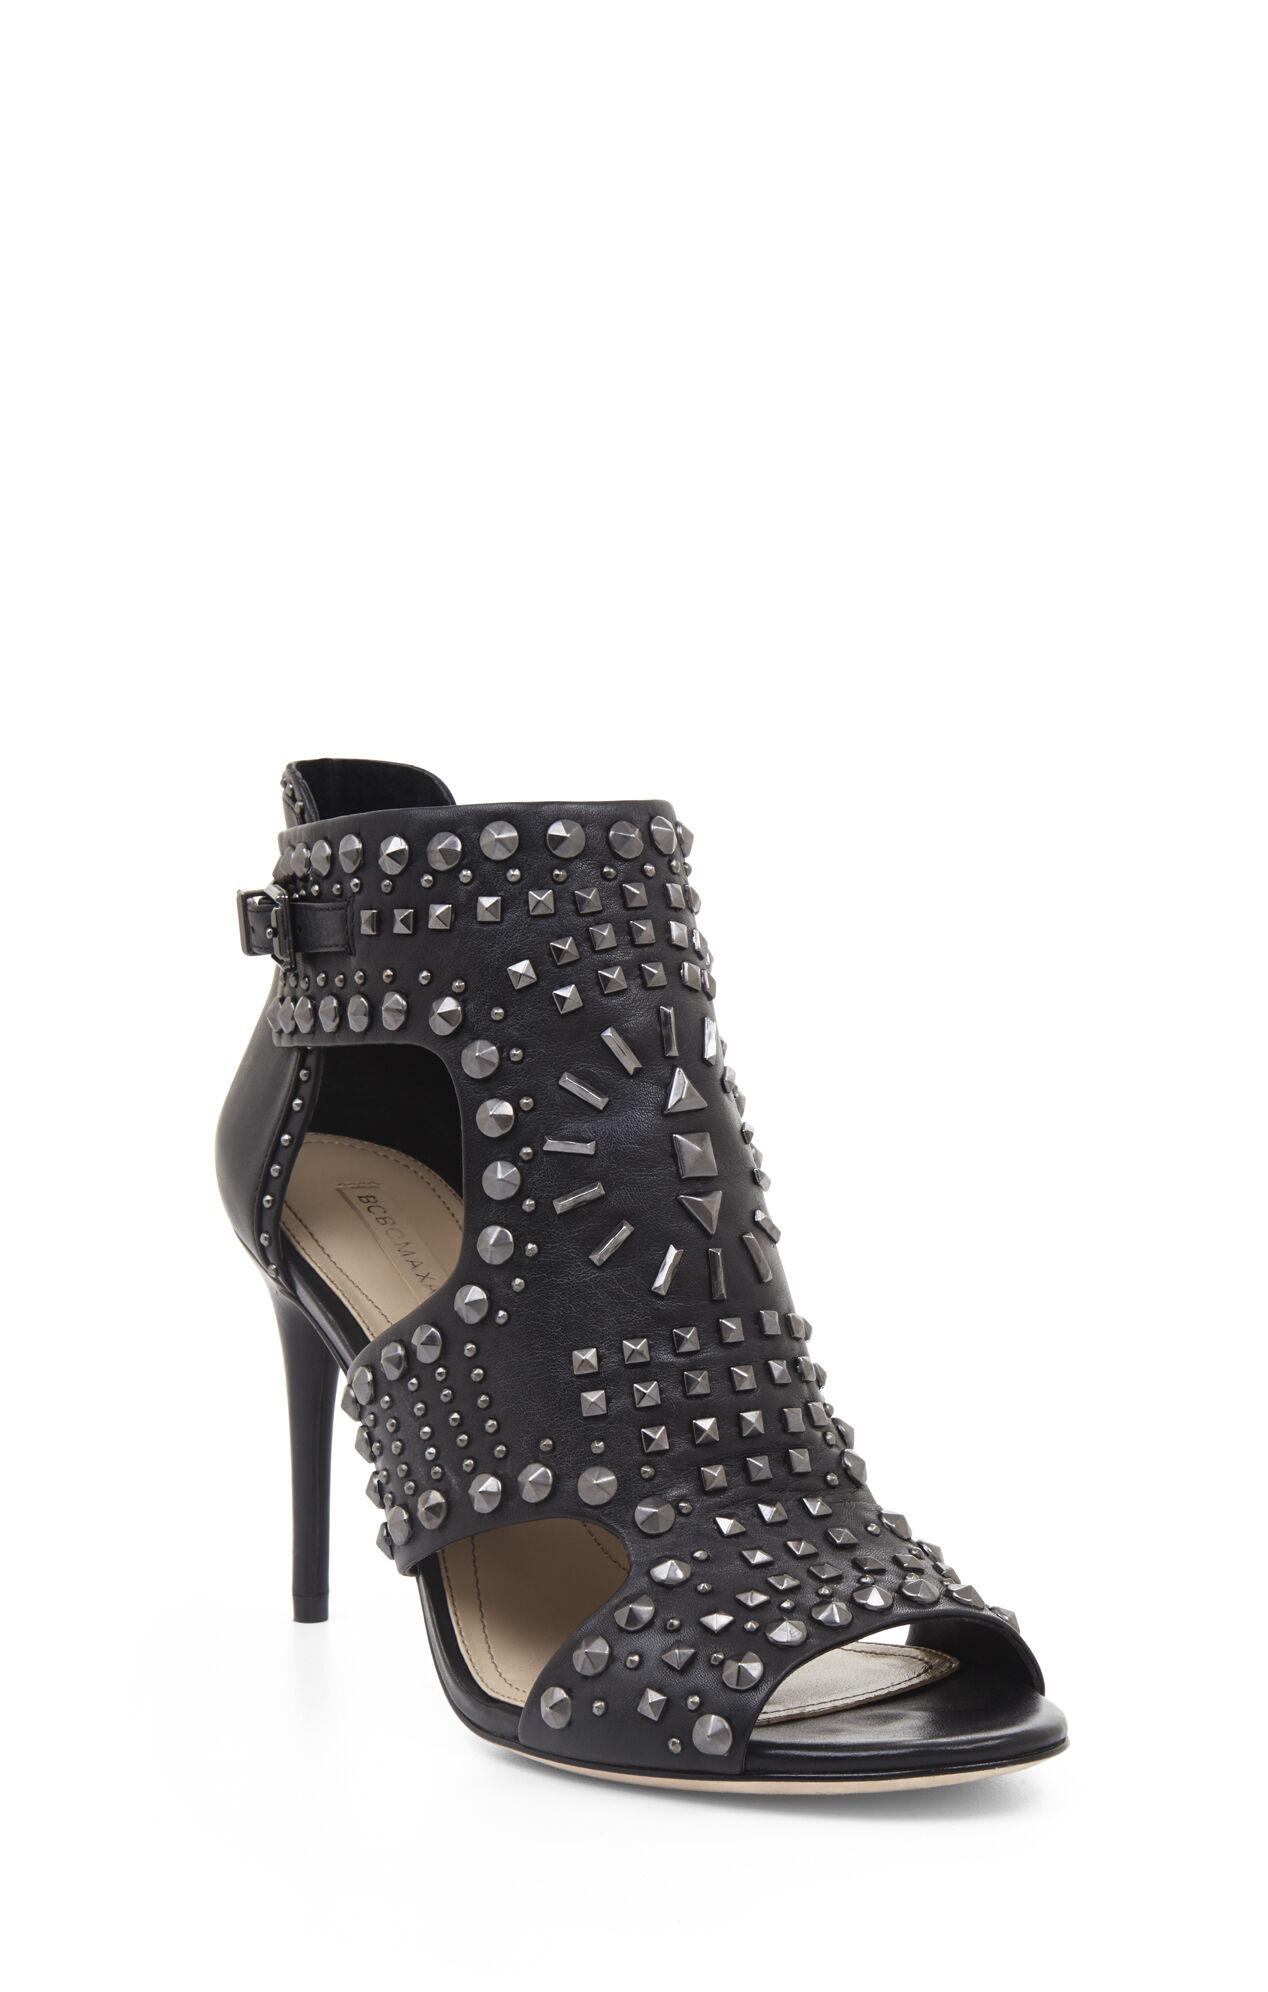 Prose High-Heel Studded Sandal